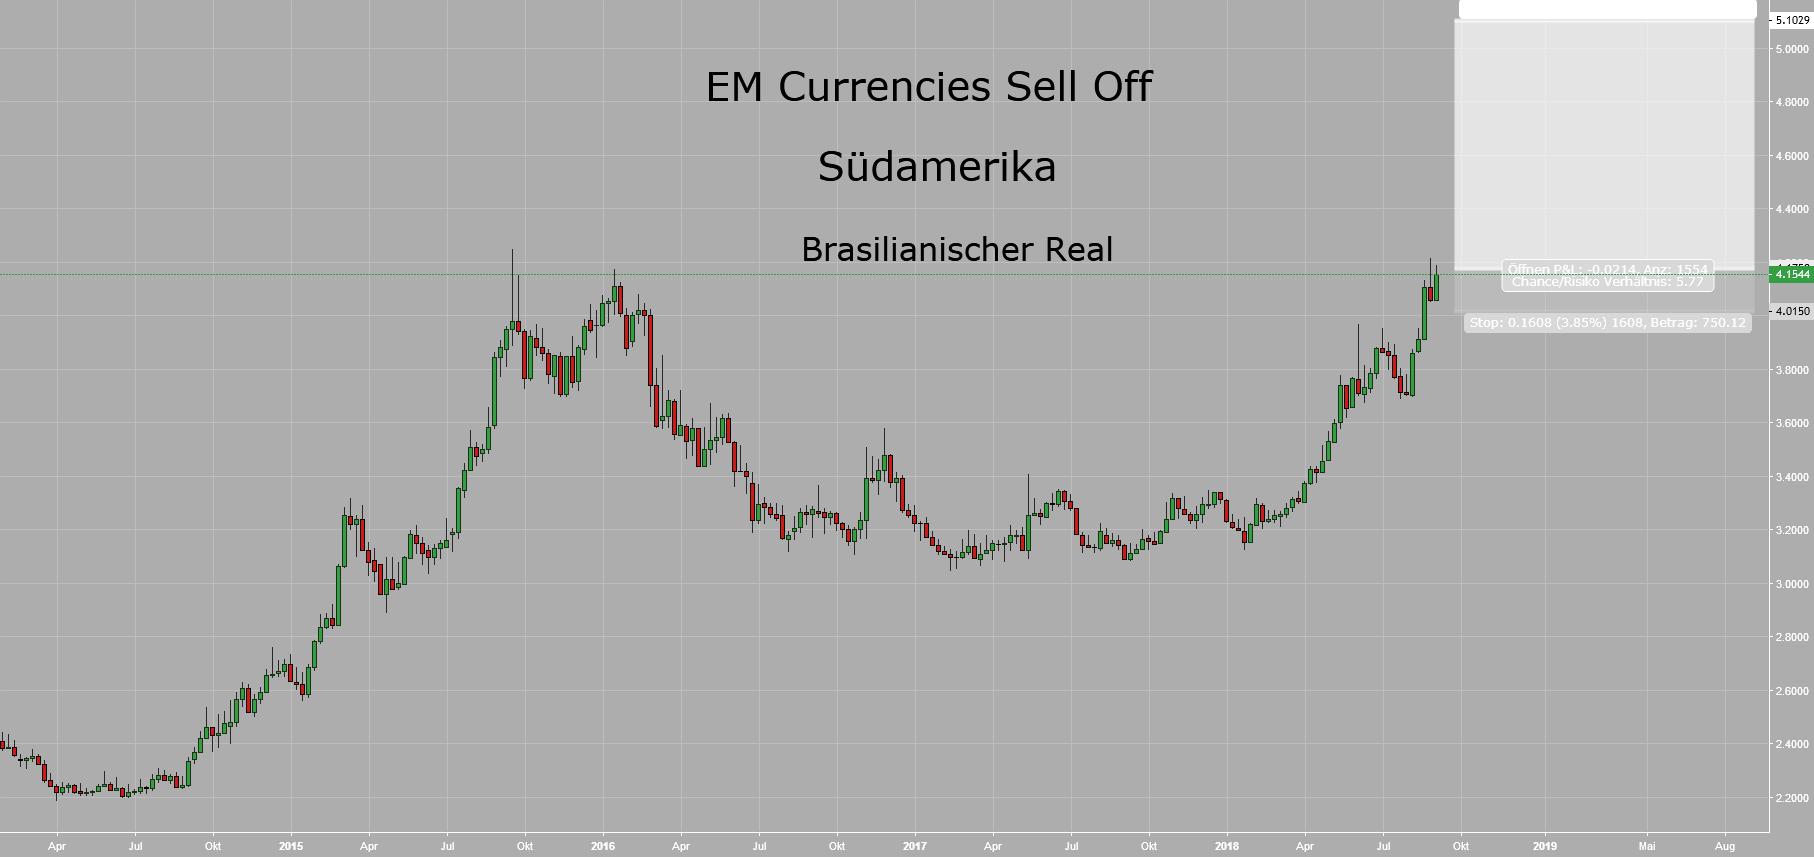 EM Currencies Sell Off IV - Südamerika II: Brasilanischer Real